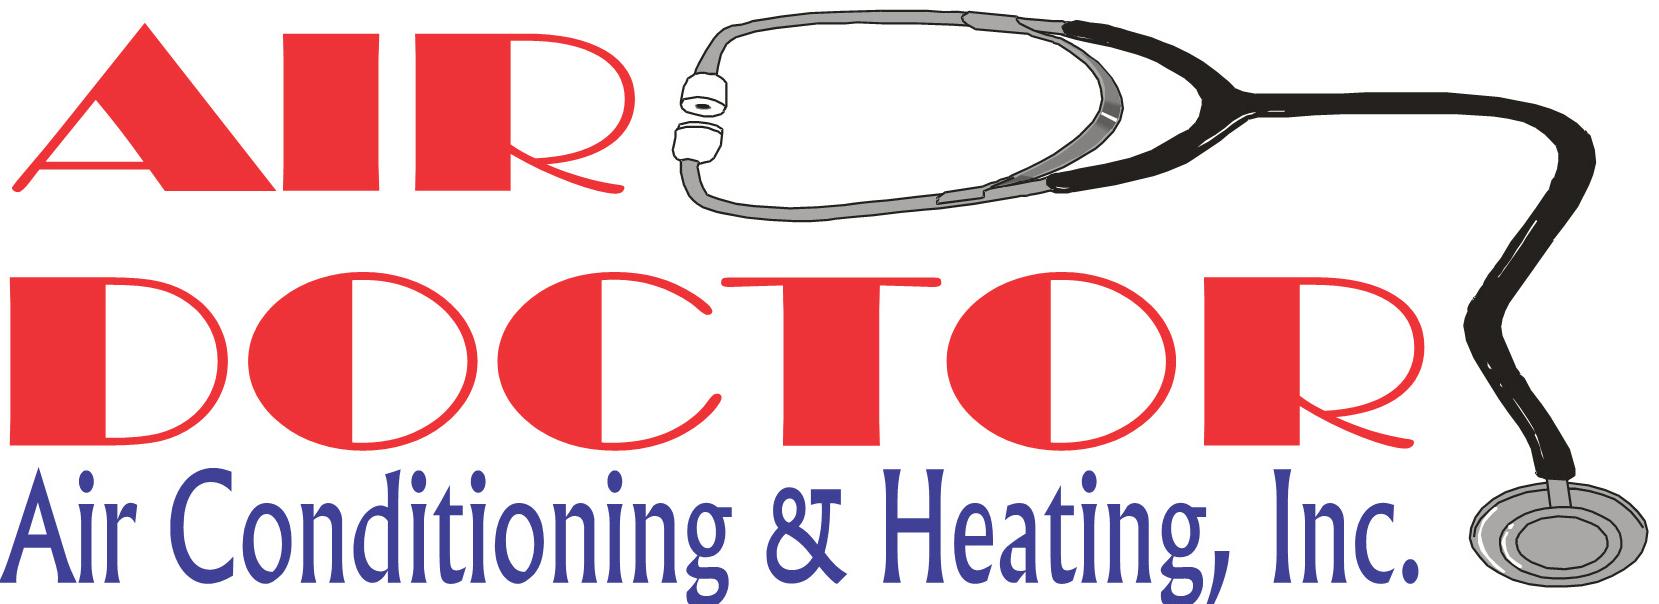 air doctor logo